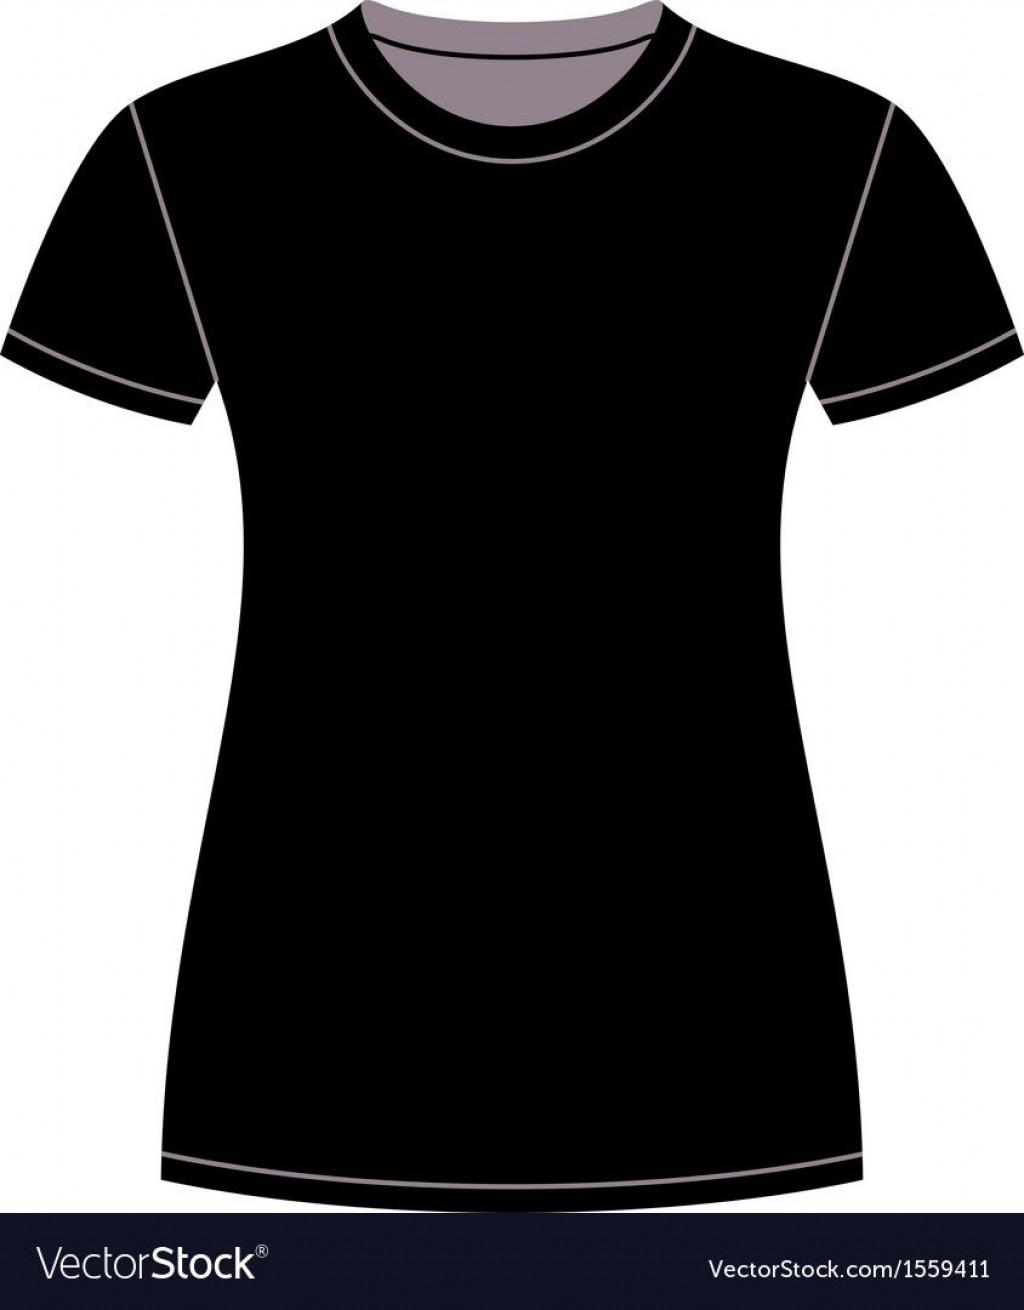 007 Phenomenal T Shirt Template Design Highest Clarity  Psd Free Download EditableLarge